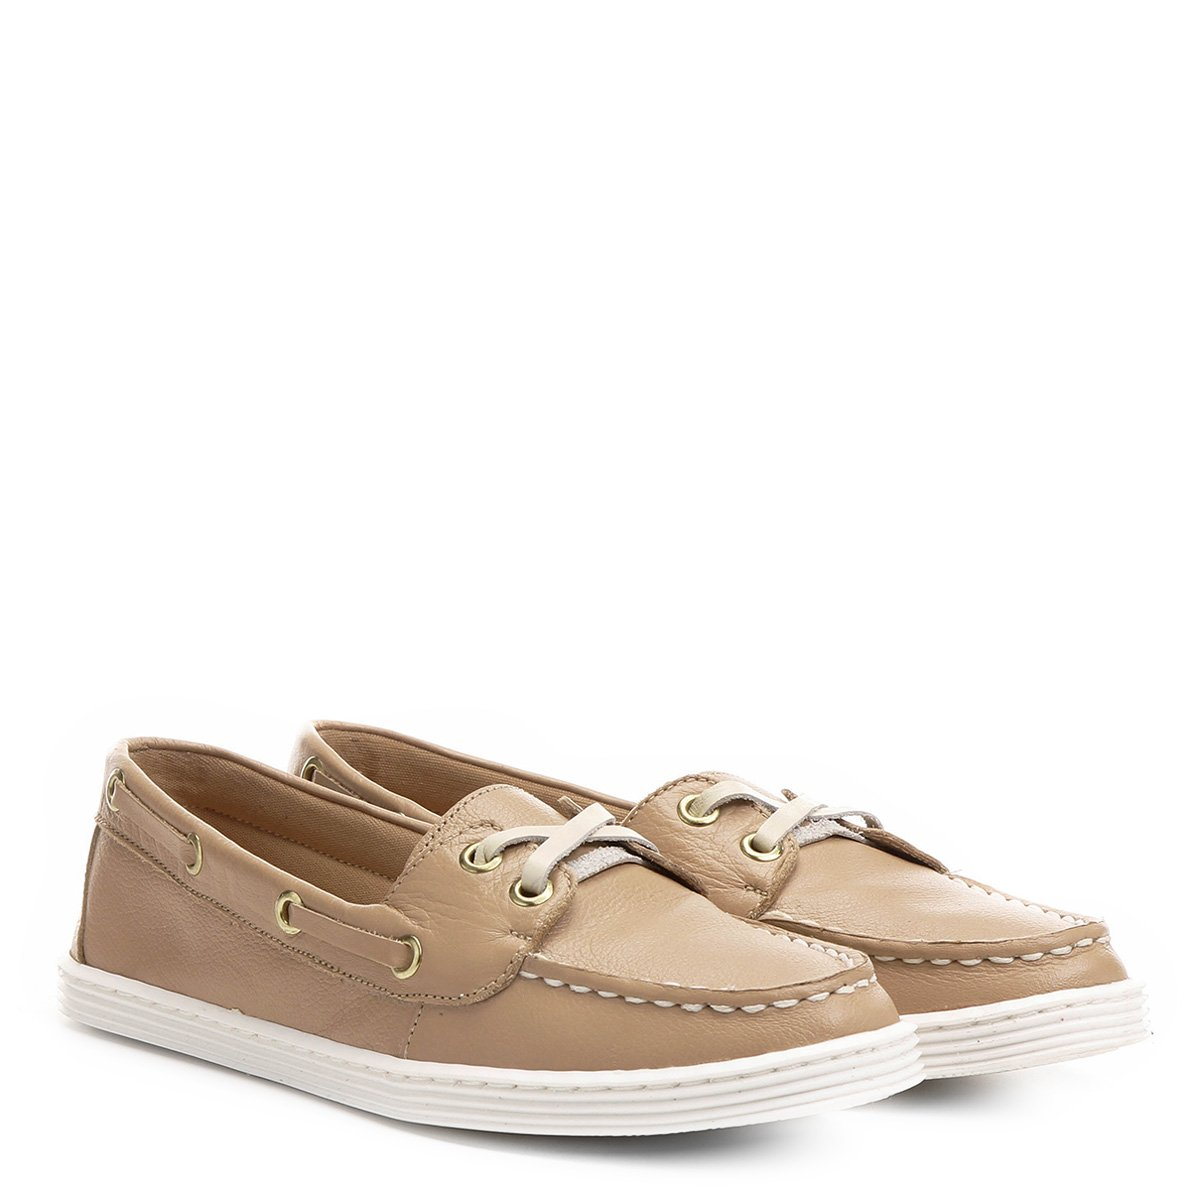 8d4a088d11 Dockside Couro Shoestock Solado Branco Feminino